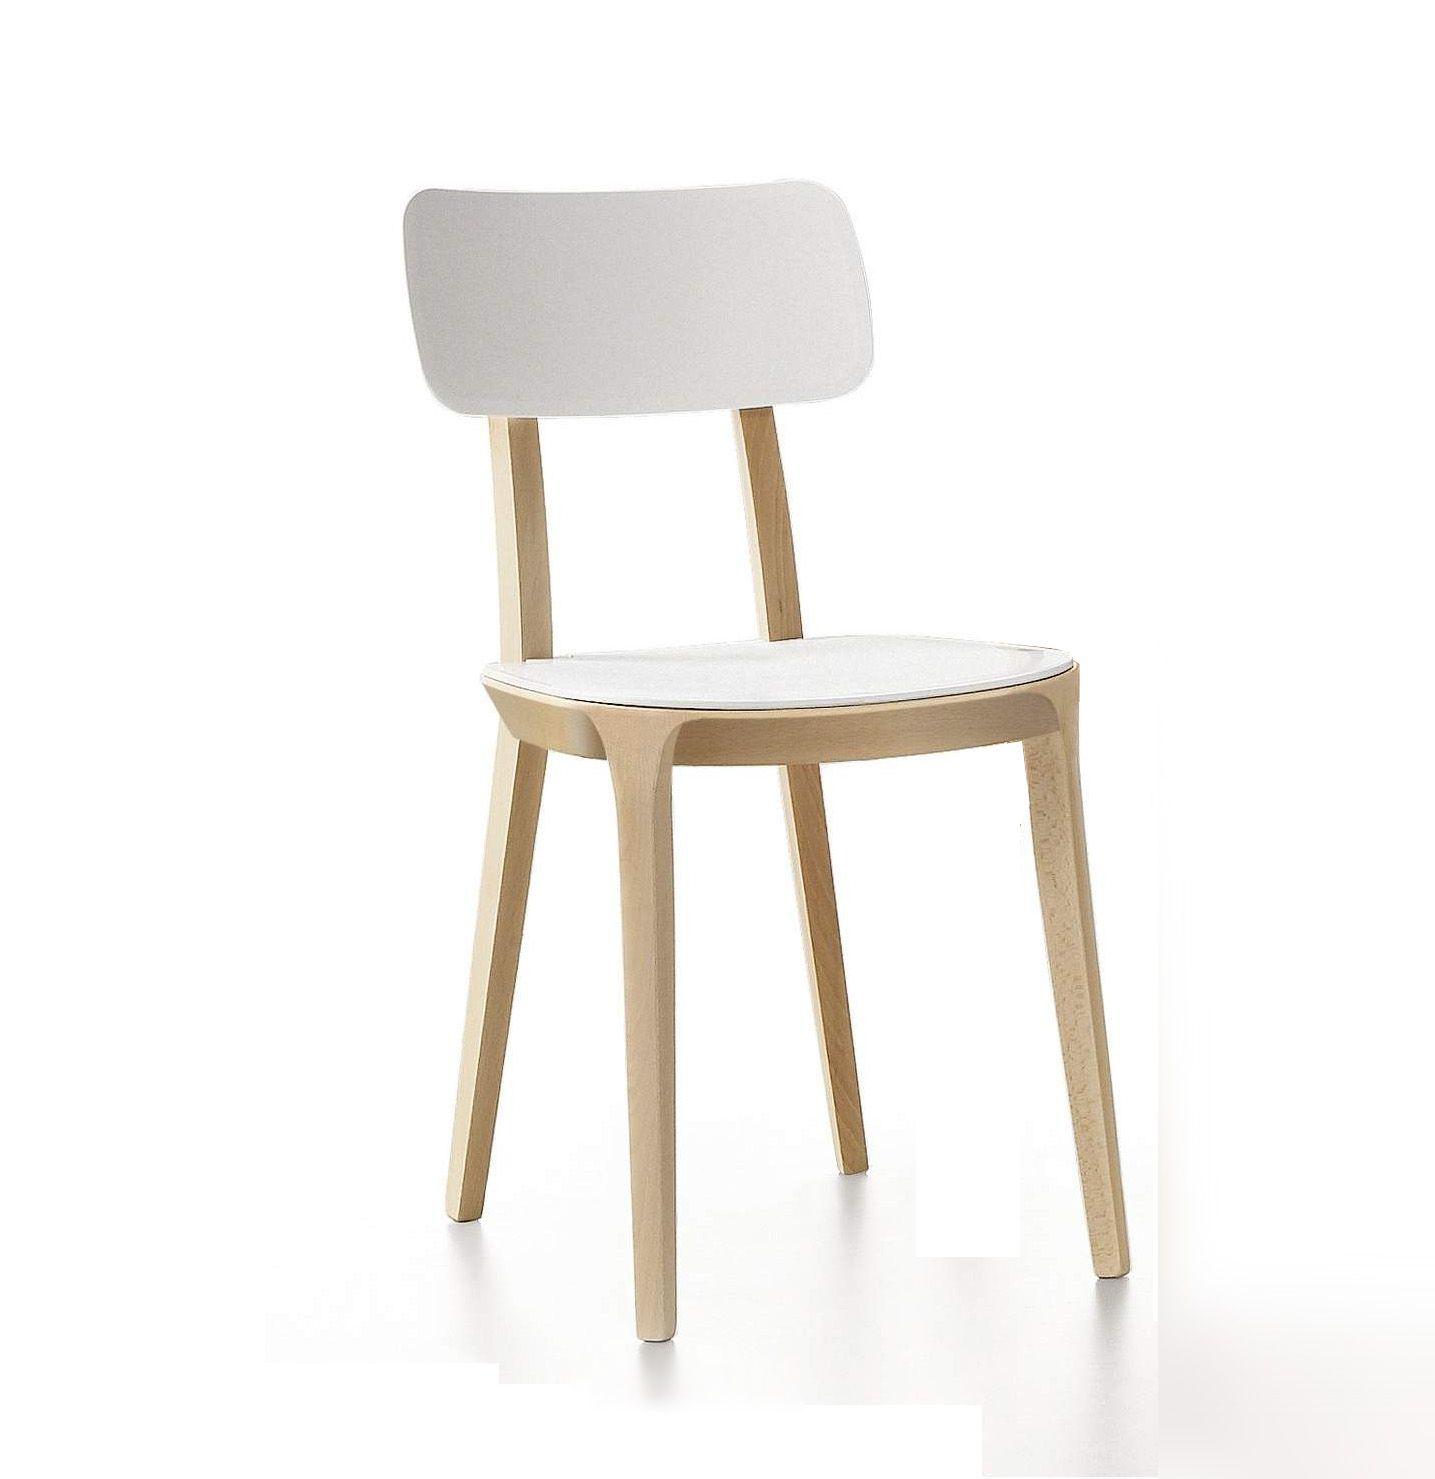 30+ Designer stuhl weiss leder Trends